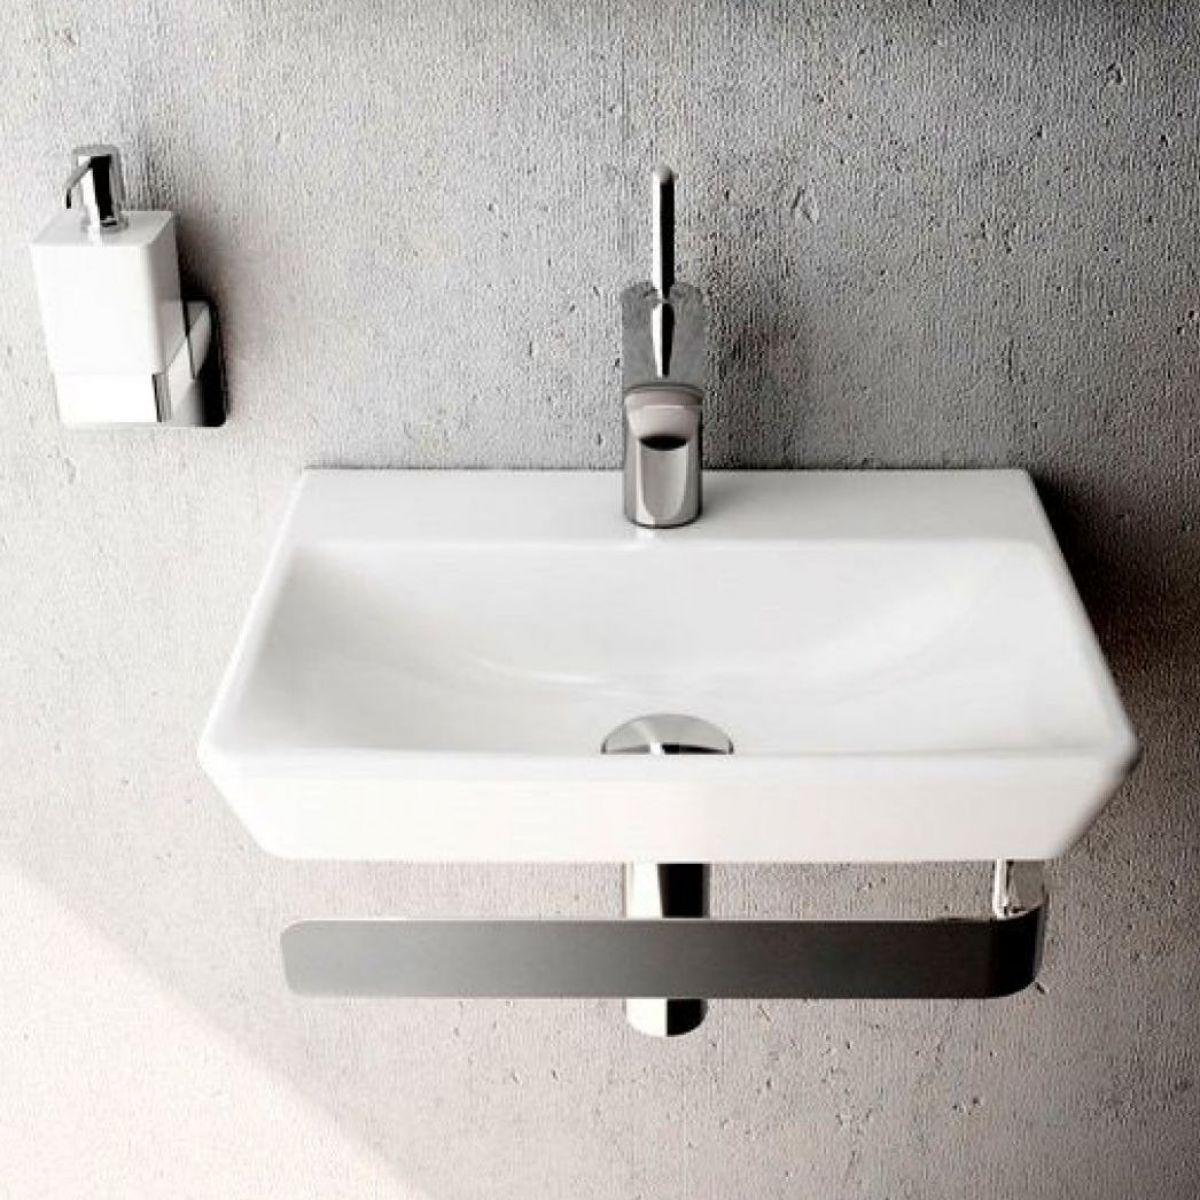 Vitra T10 Cloakroom Basin : UK Bathrooms